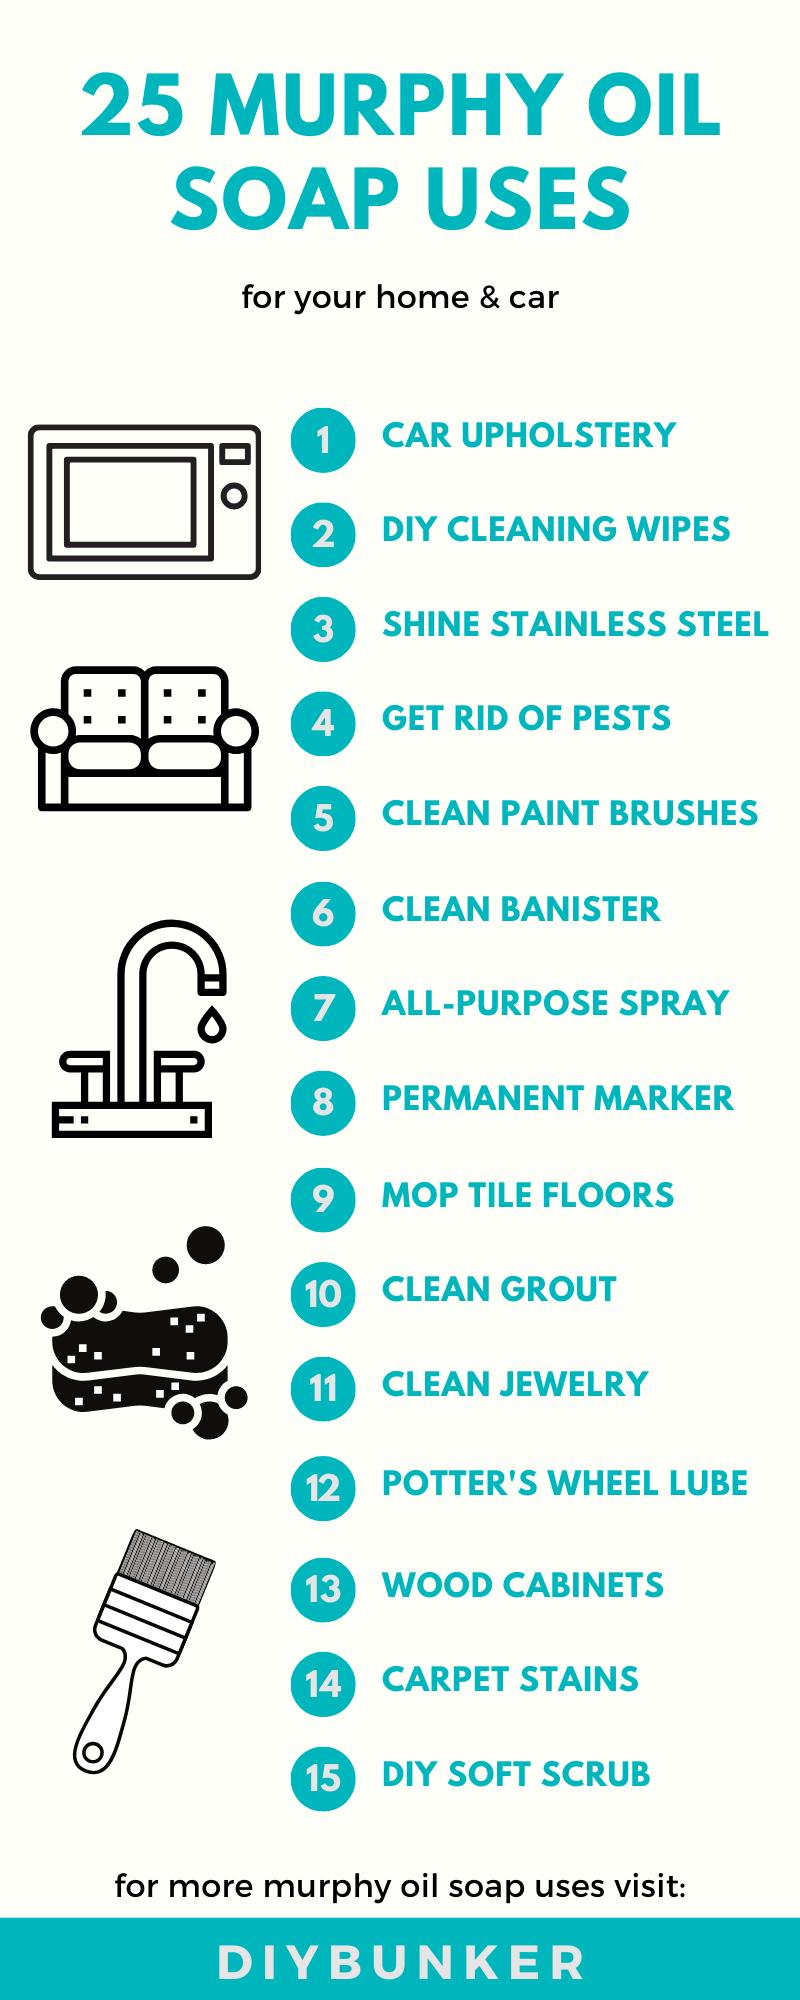 25 Murphy Oil Soap Uses